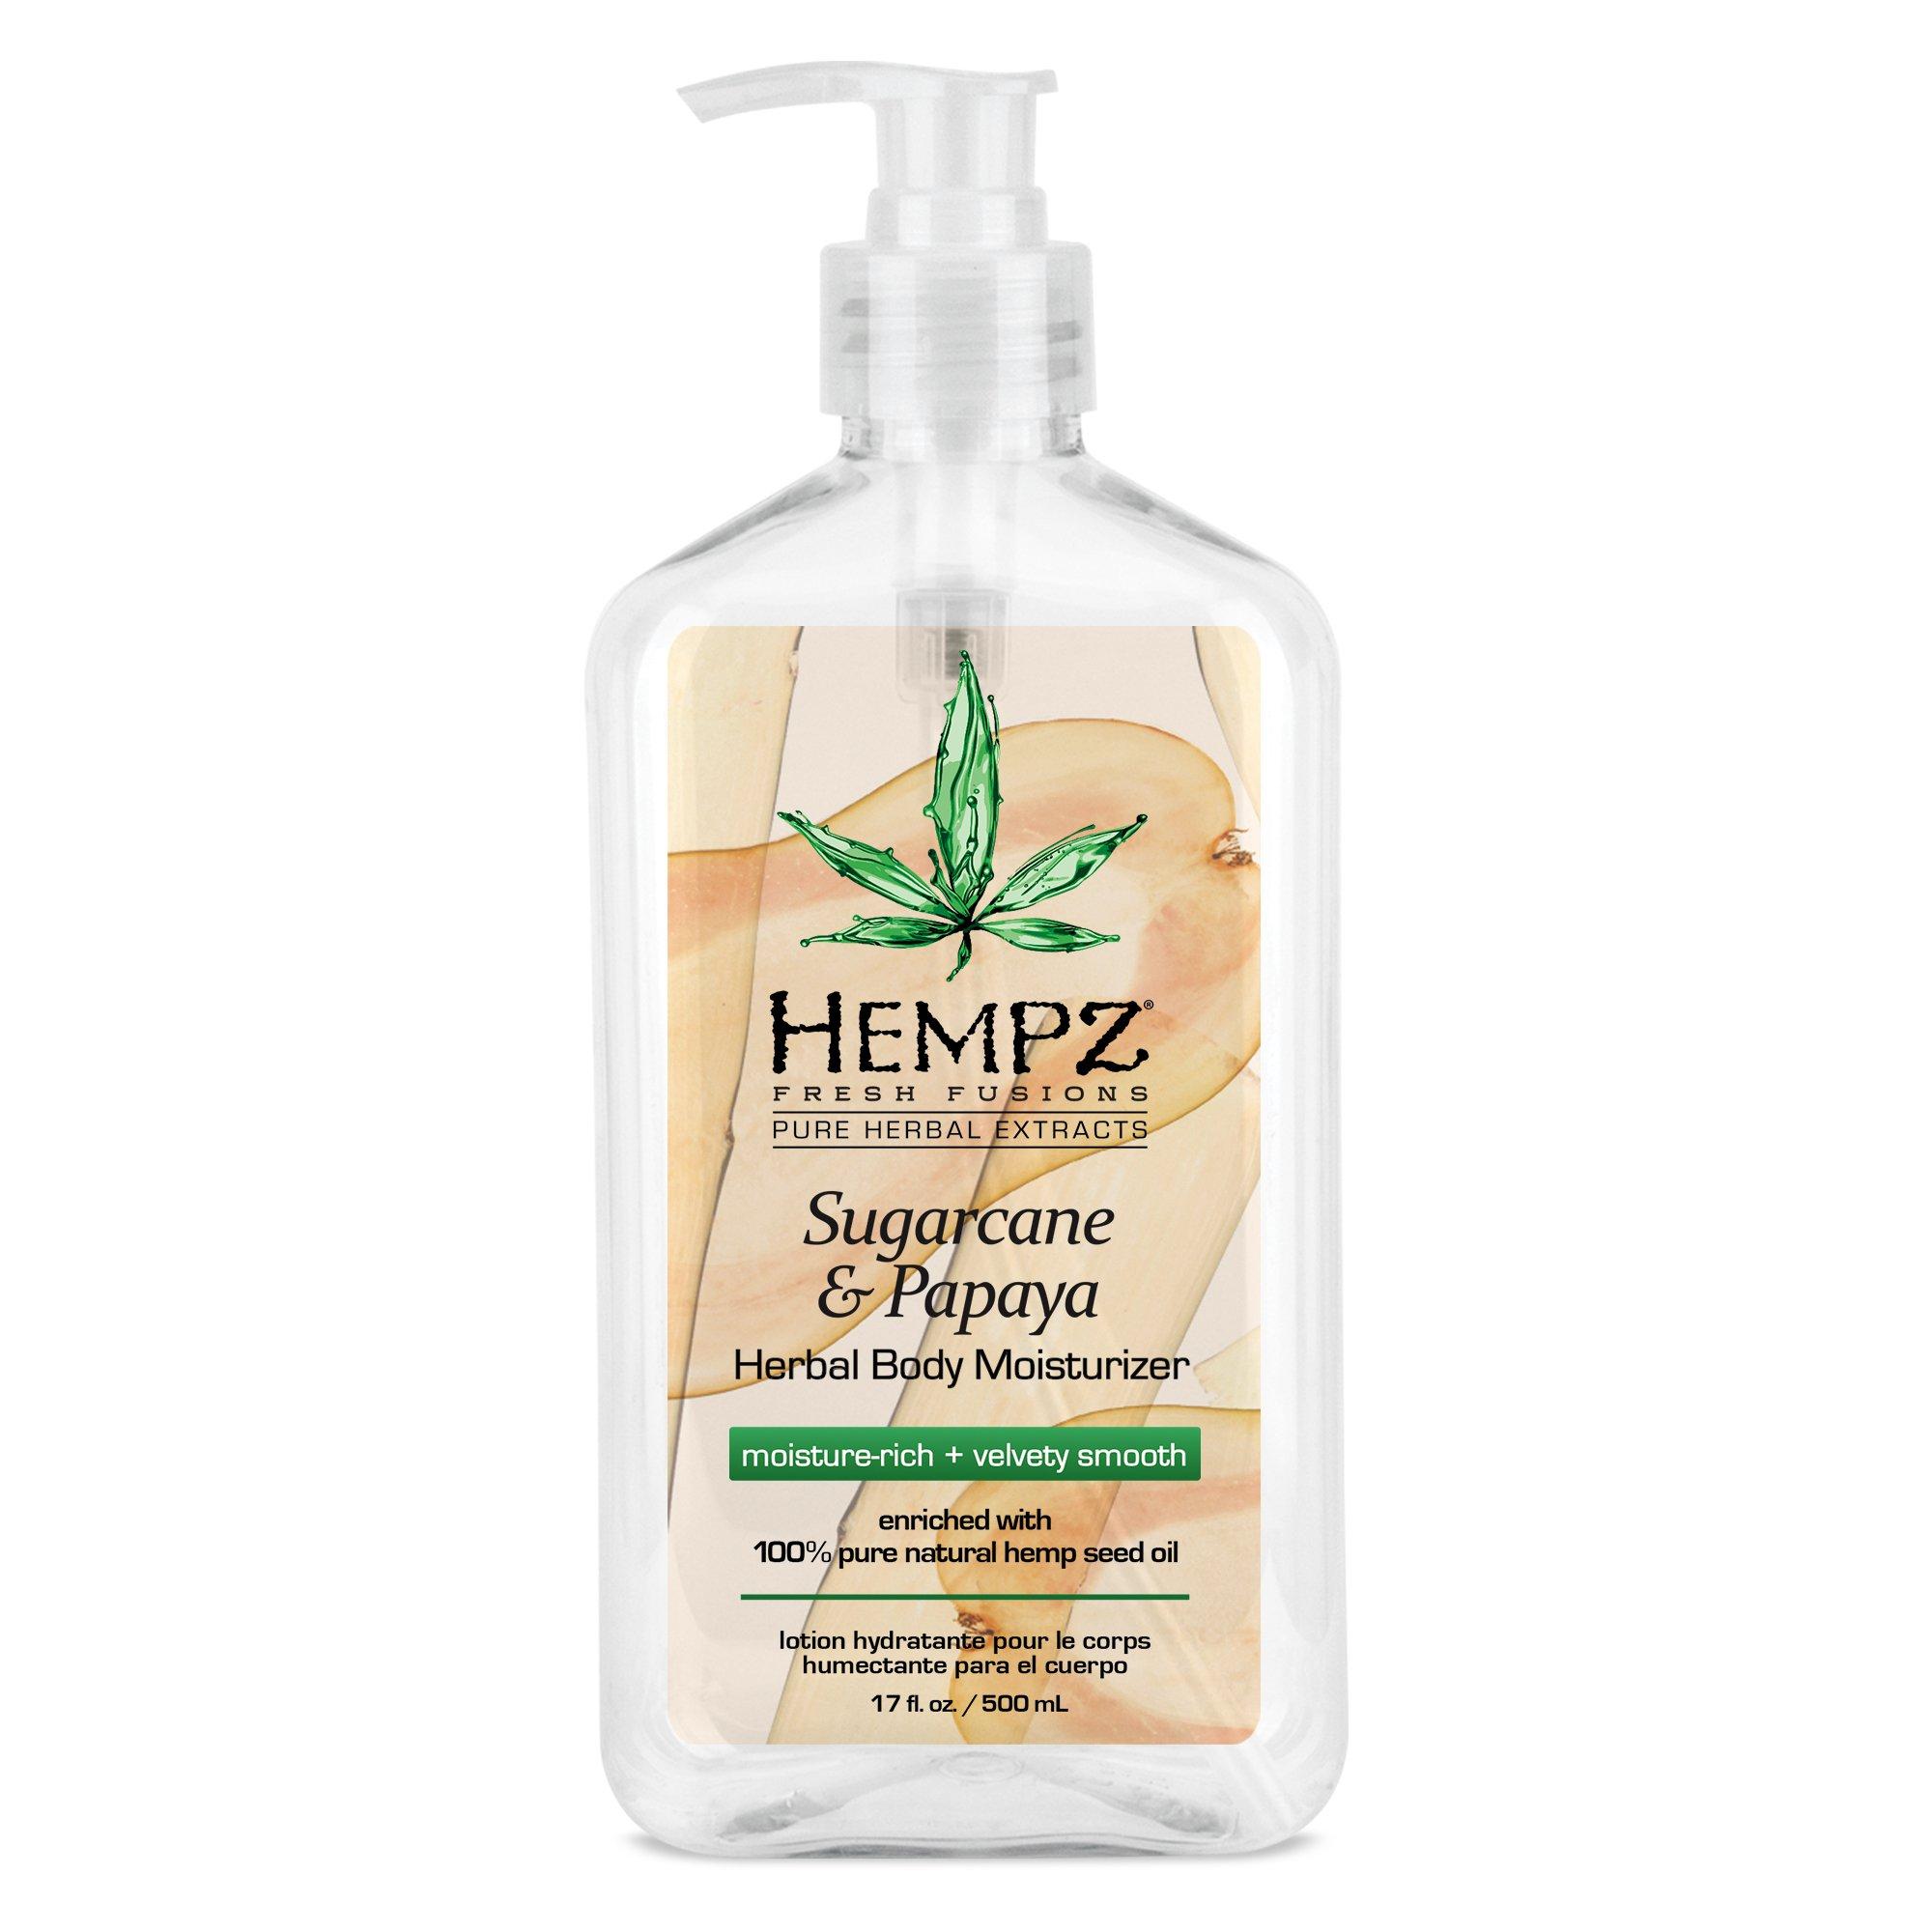 Hempz - Hempz Sugarcane & Papaya Herbal Body Moisturizer 17.0 oz